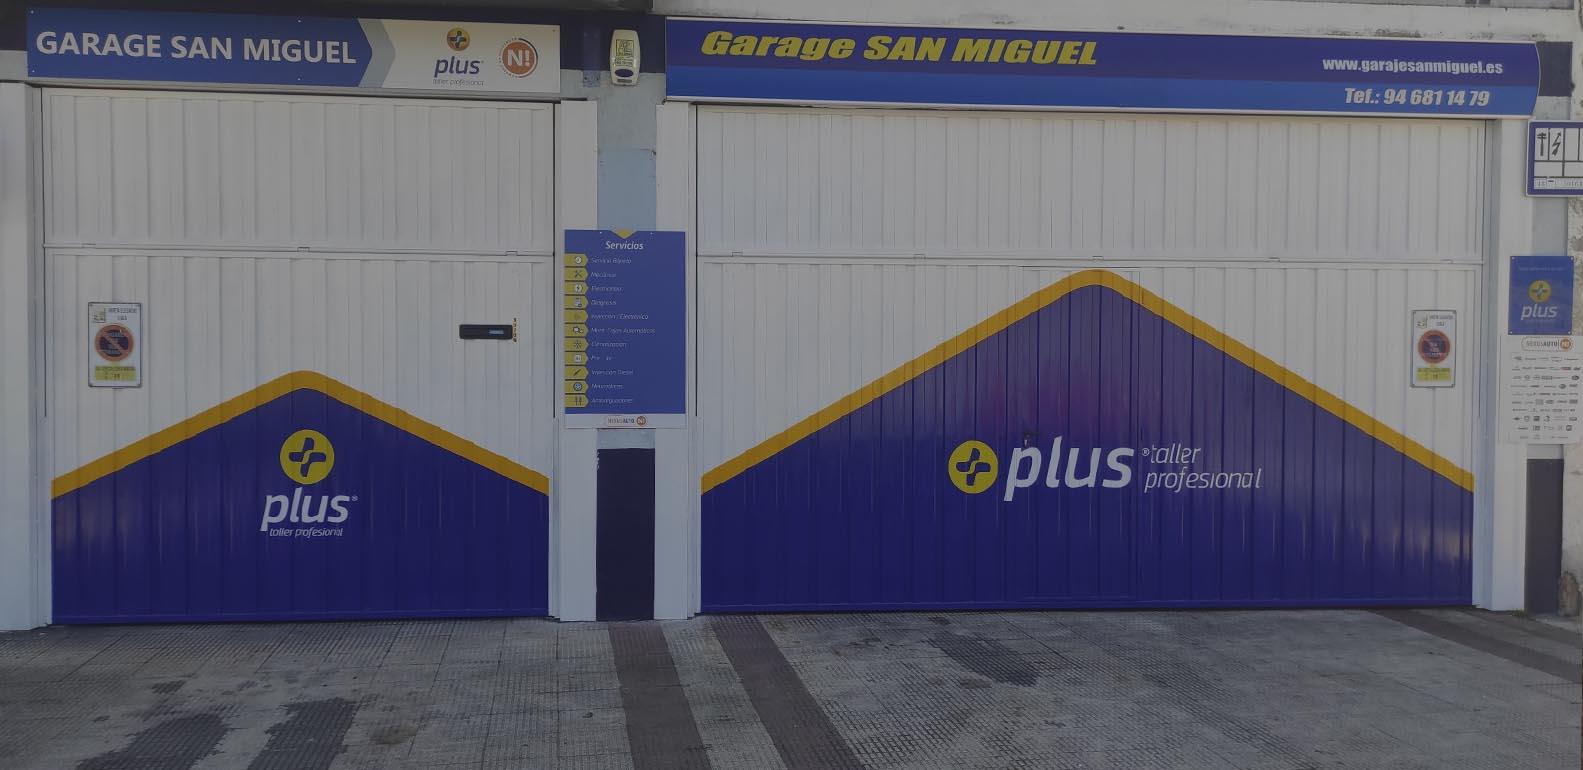 Garage San Miguel